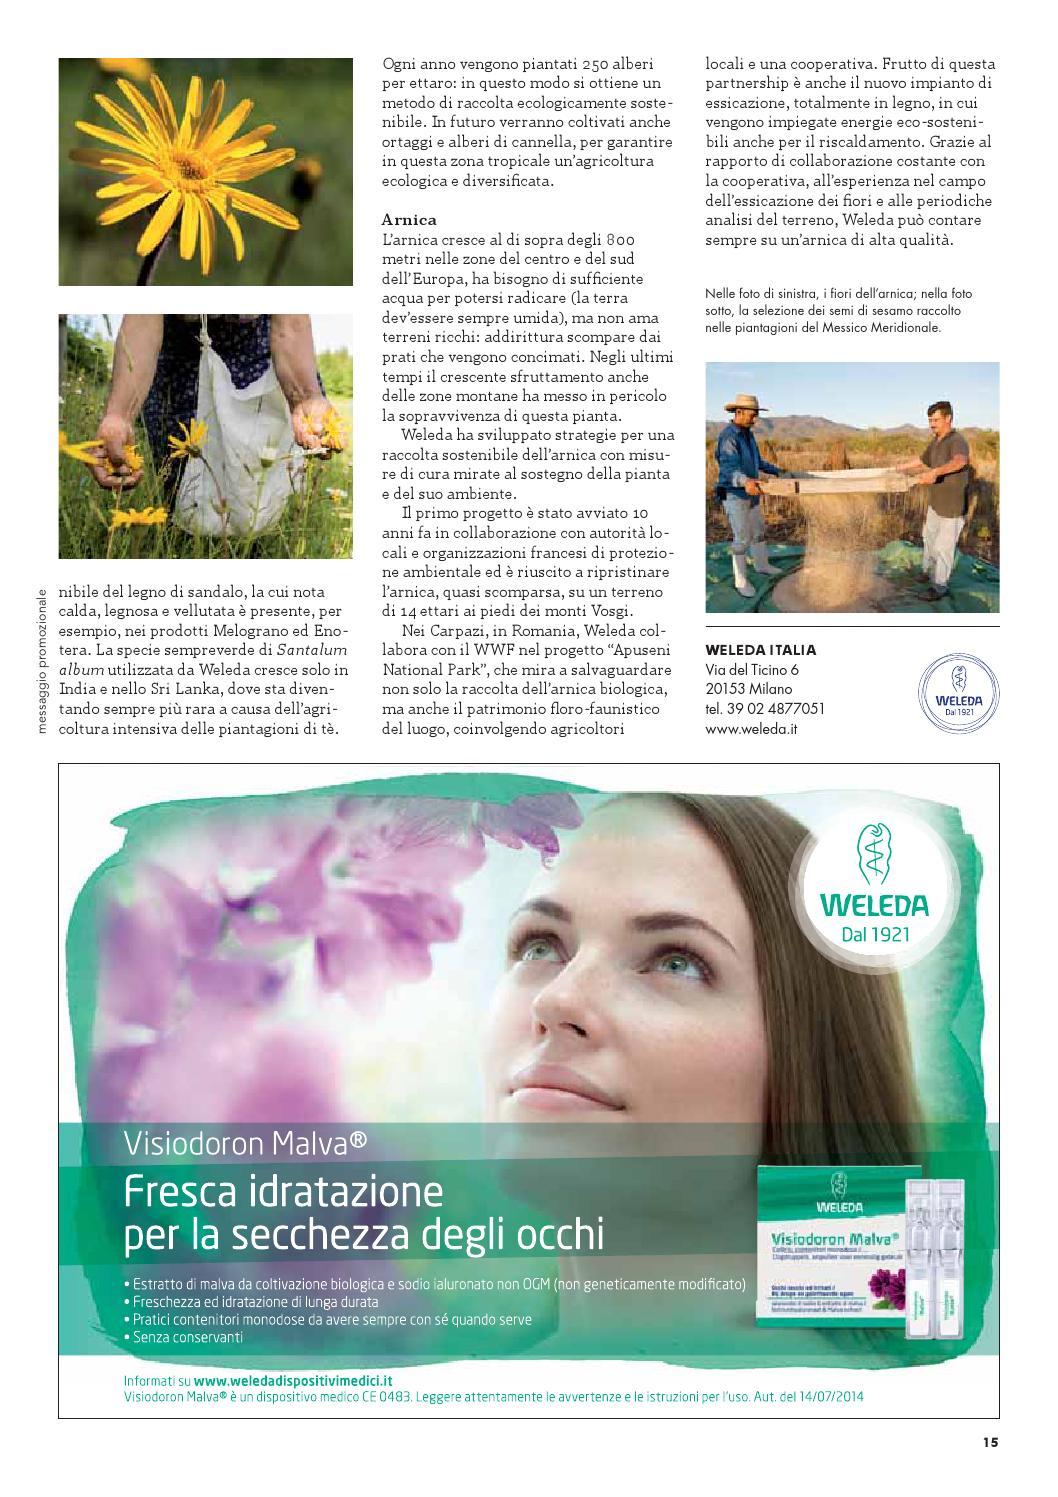 5 Naturasì 2016 Numero MagazineGennaio 2016 Numero Naturasì MagazineGennaio nkO0Pw